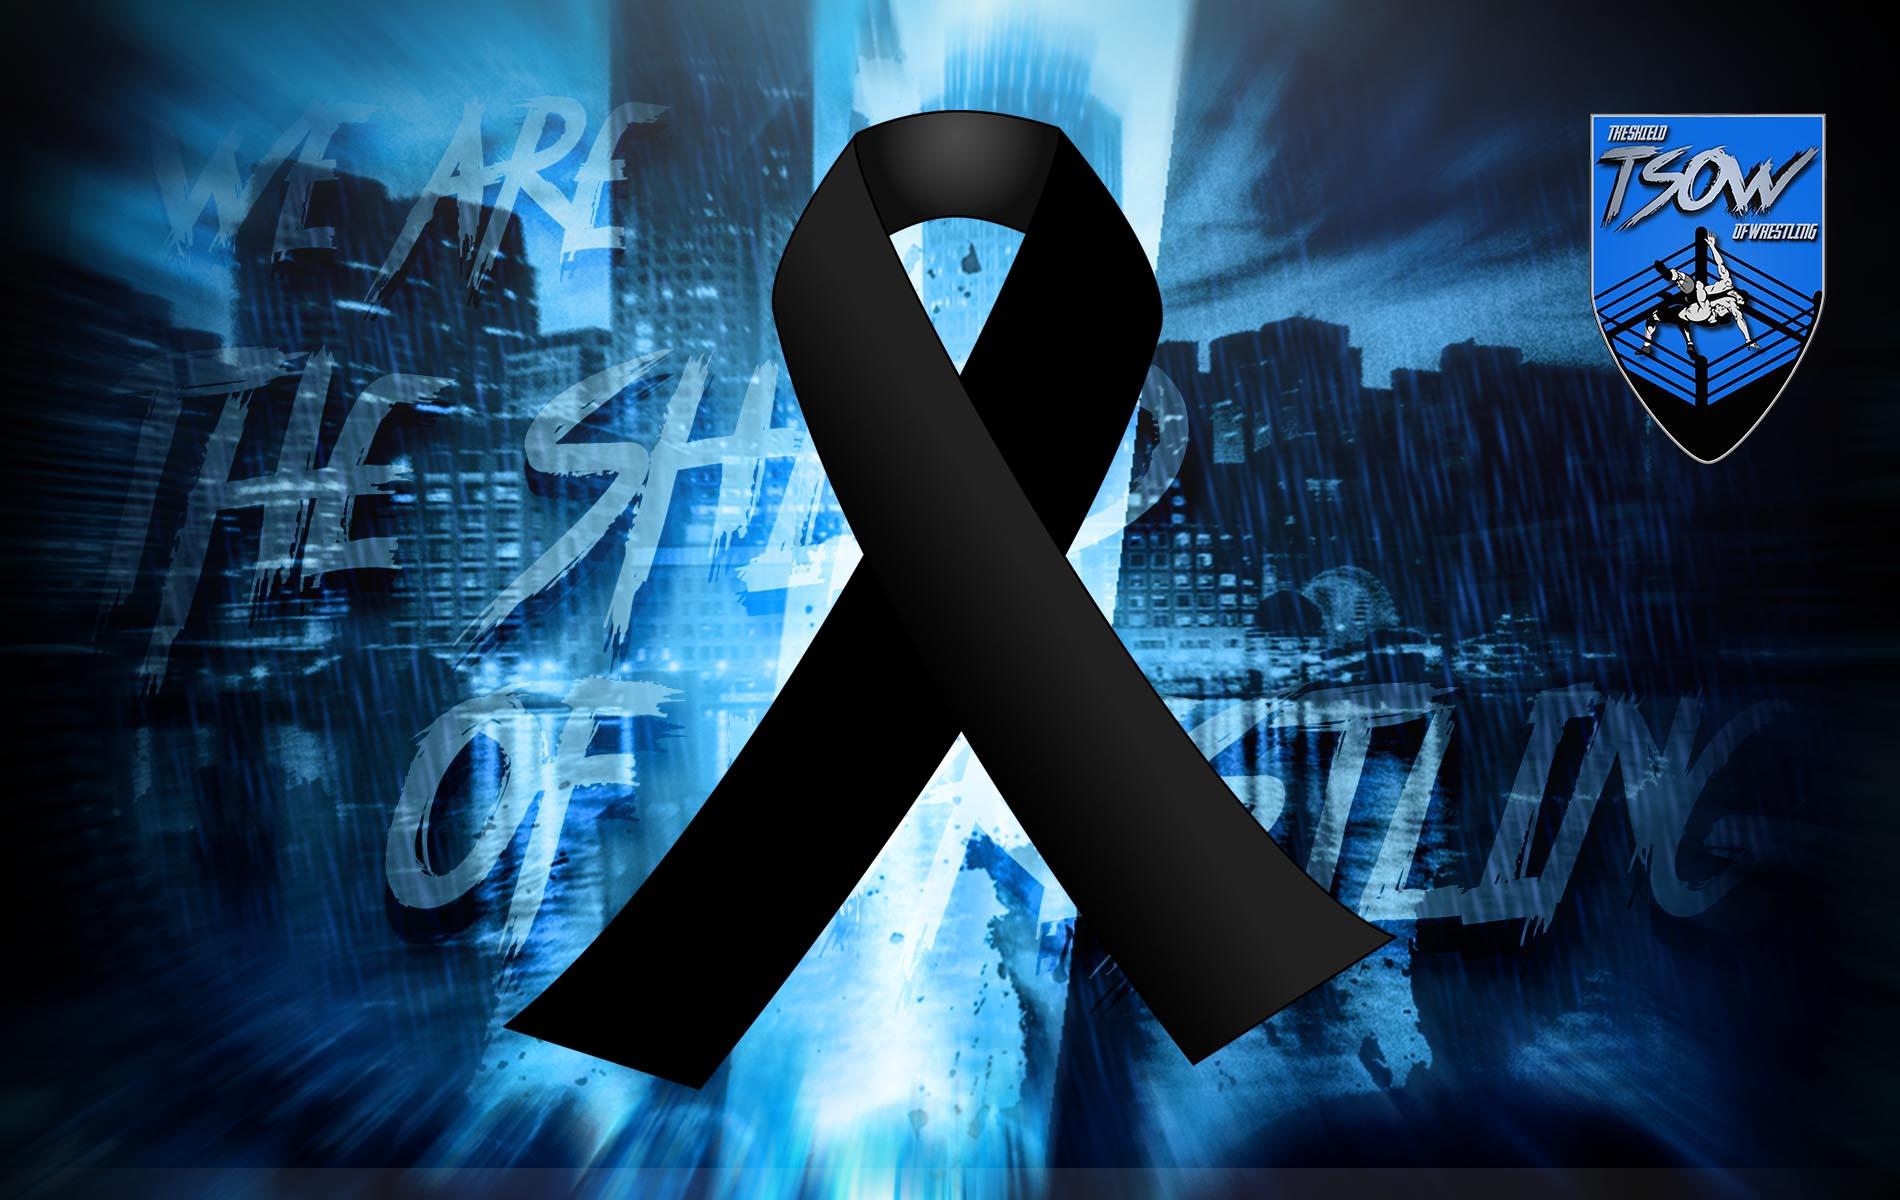 Don Kernodle è scomparso a 71 anni